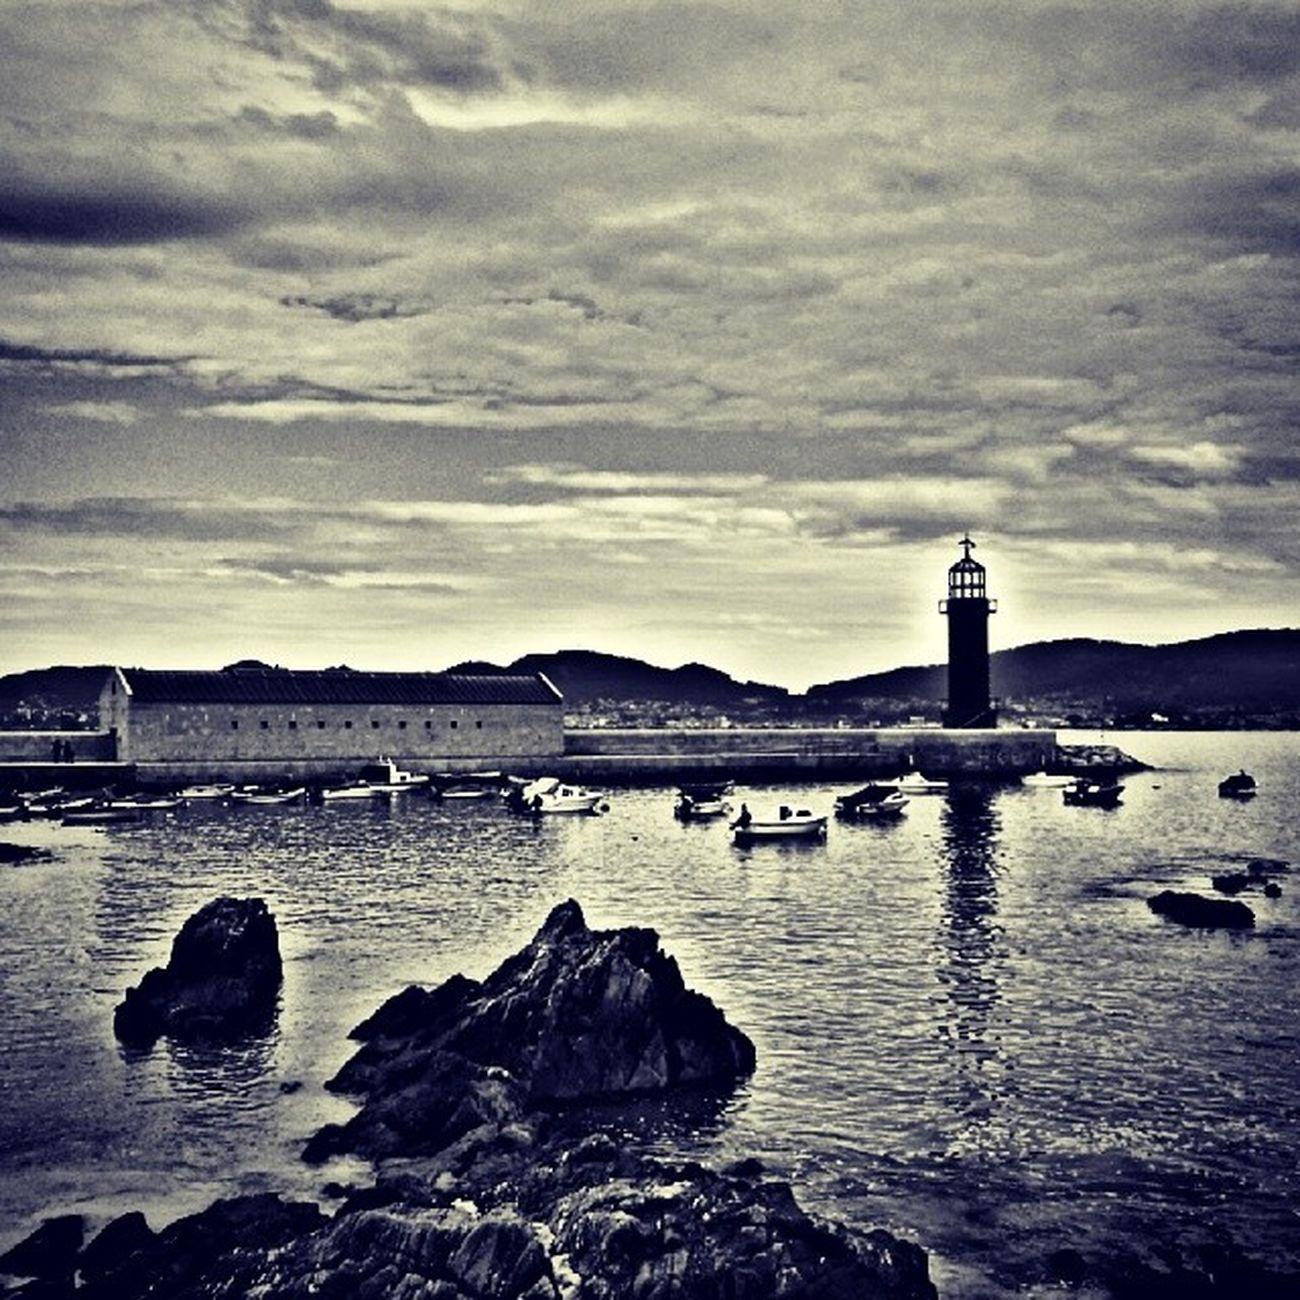 Días grises...?? Museodelmar Alcabre Vigo Vistoenvigo loves_vigo loves_galicia loves_nubes en140instantes estaes_galicia estaes_espania welcometogalicia galiciacalidade galiciaglobal cielosdegalicia galiciagrafias riasbaixas atlanticamente rinconesgallegos rg_foto alcabre, vigo faro lighthouse museum blackandwhite bnw loves_bnw